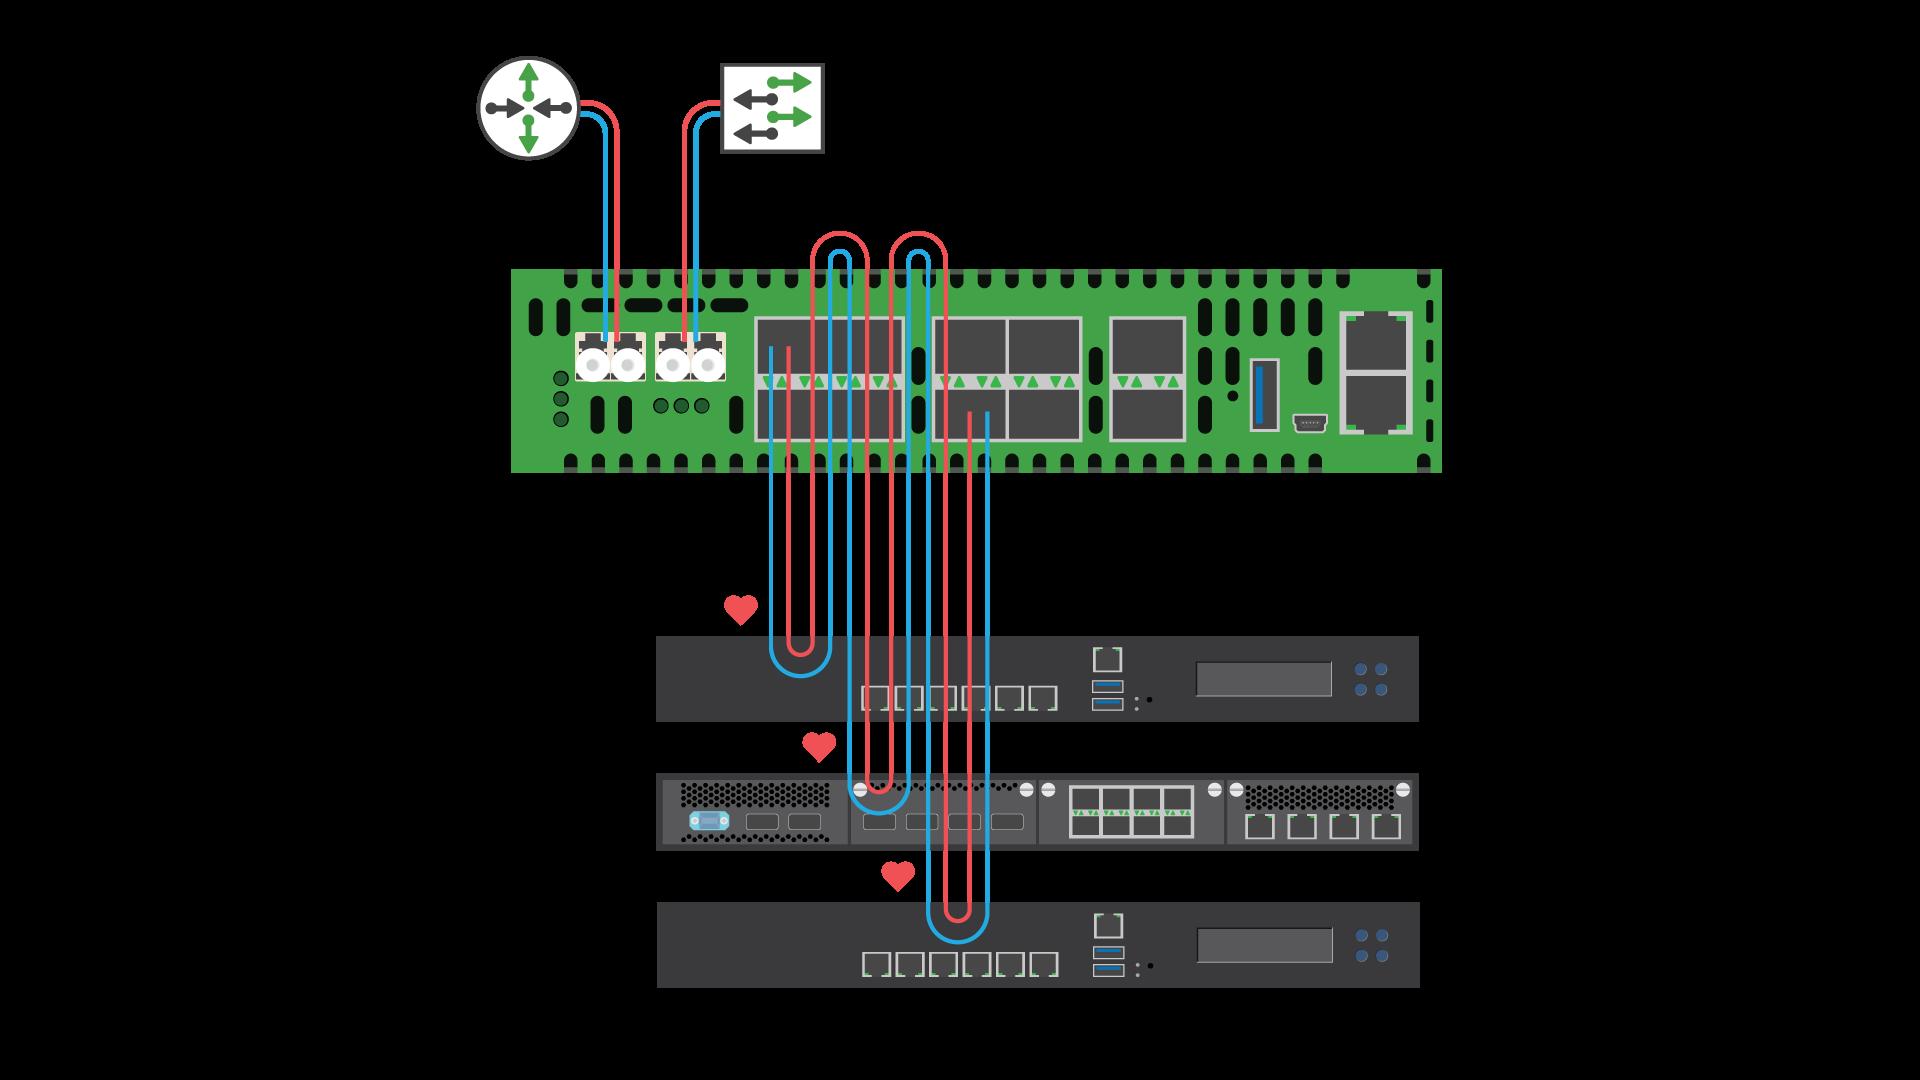 EdgeLens-Focus-Inline-Security-Packet-Broker-Tool-Chaining